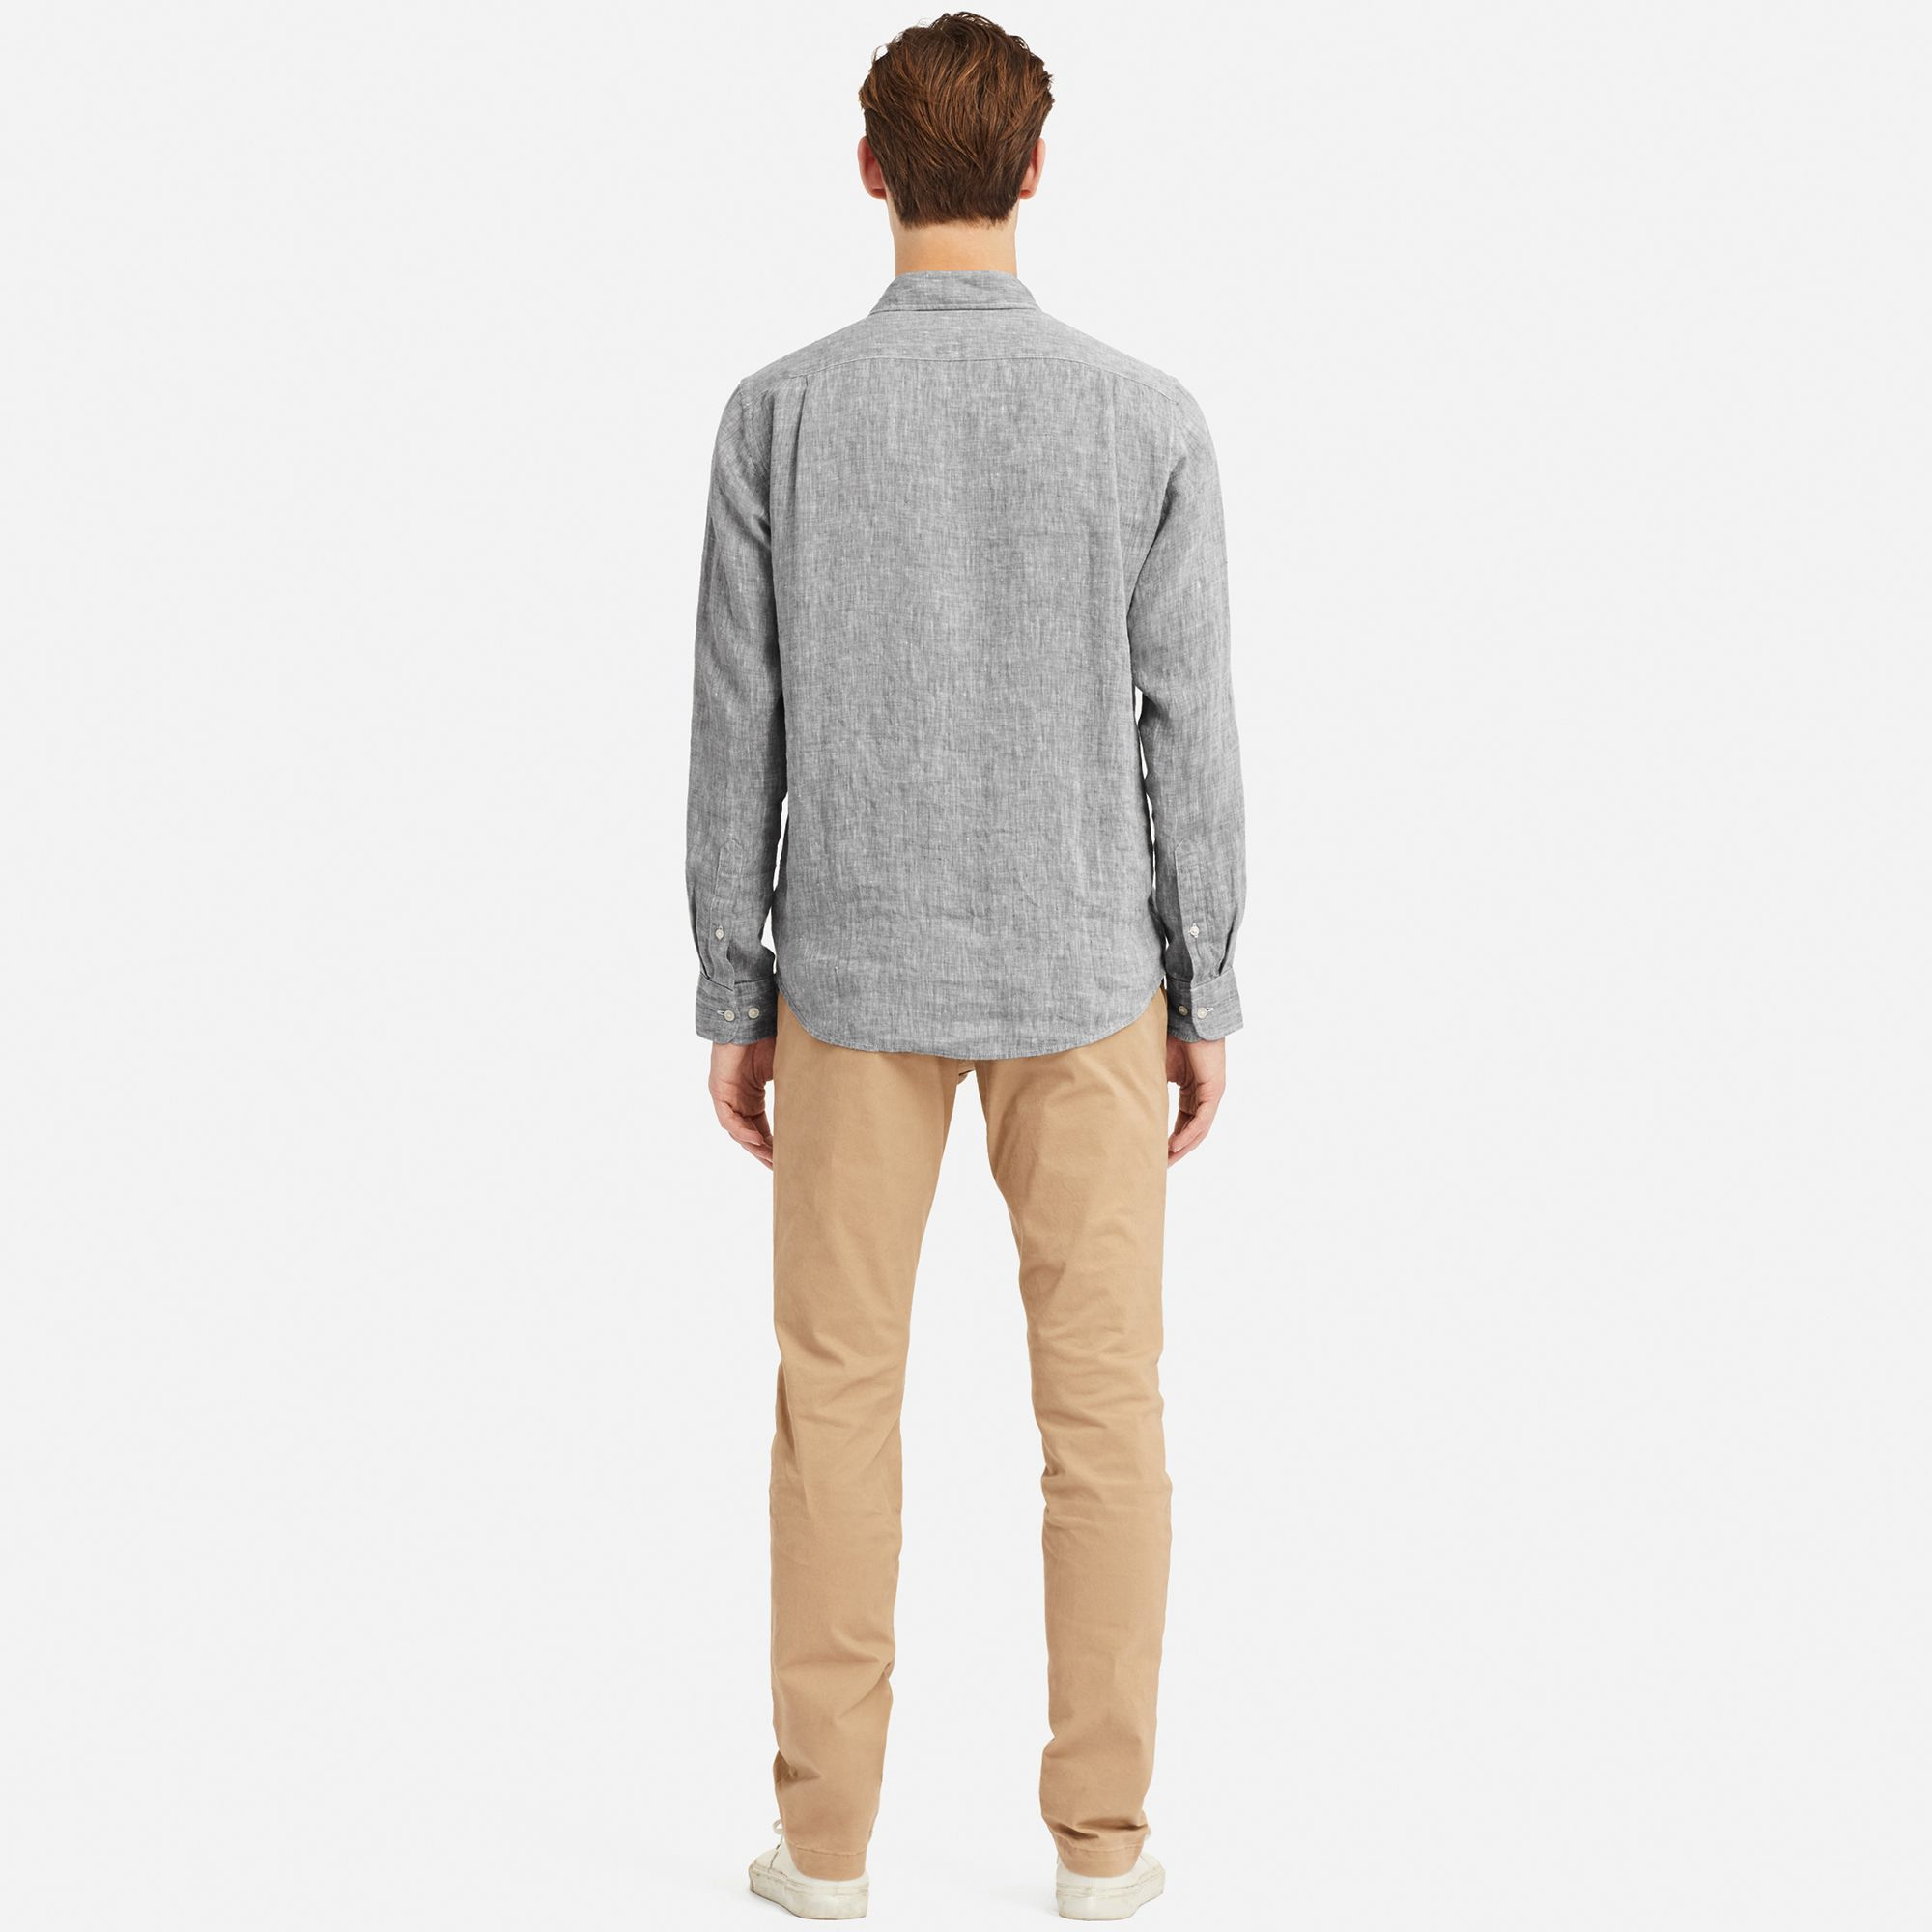 3acd4b7f6bc Uniqlo Premium Linen Long Sleeve Shirt – EDGE Engineering and ...